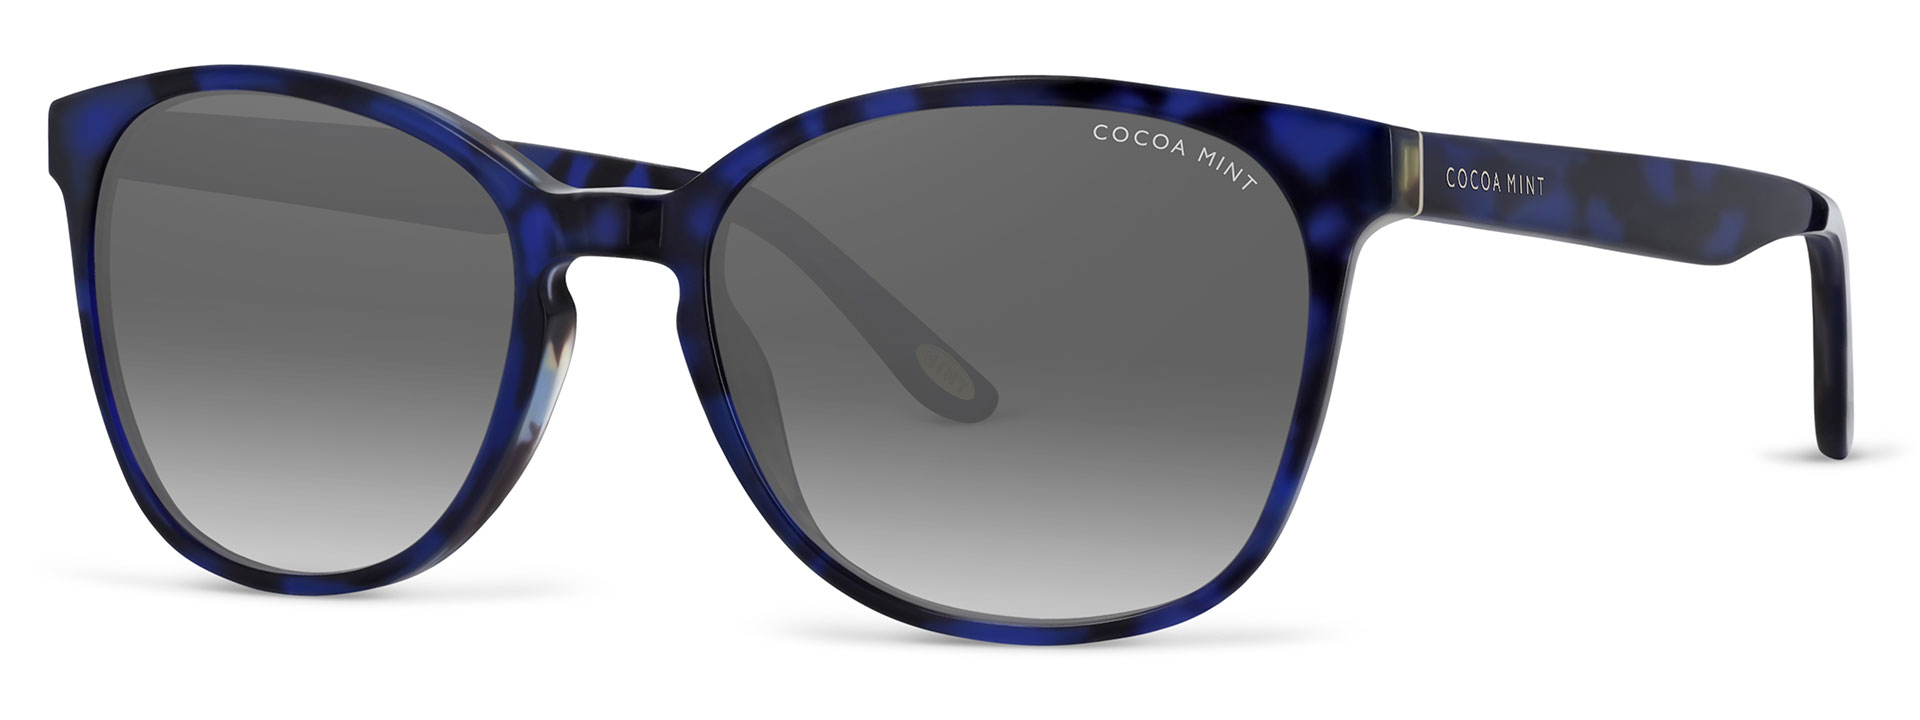 Cocoa Mint Sun Glasses - Blue - CMS2063-C1